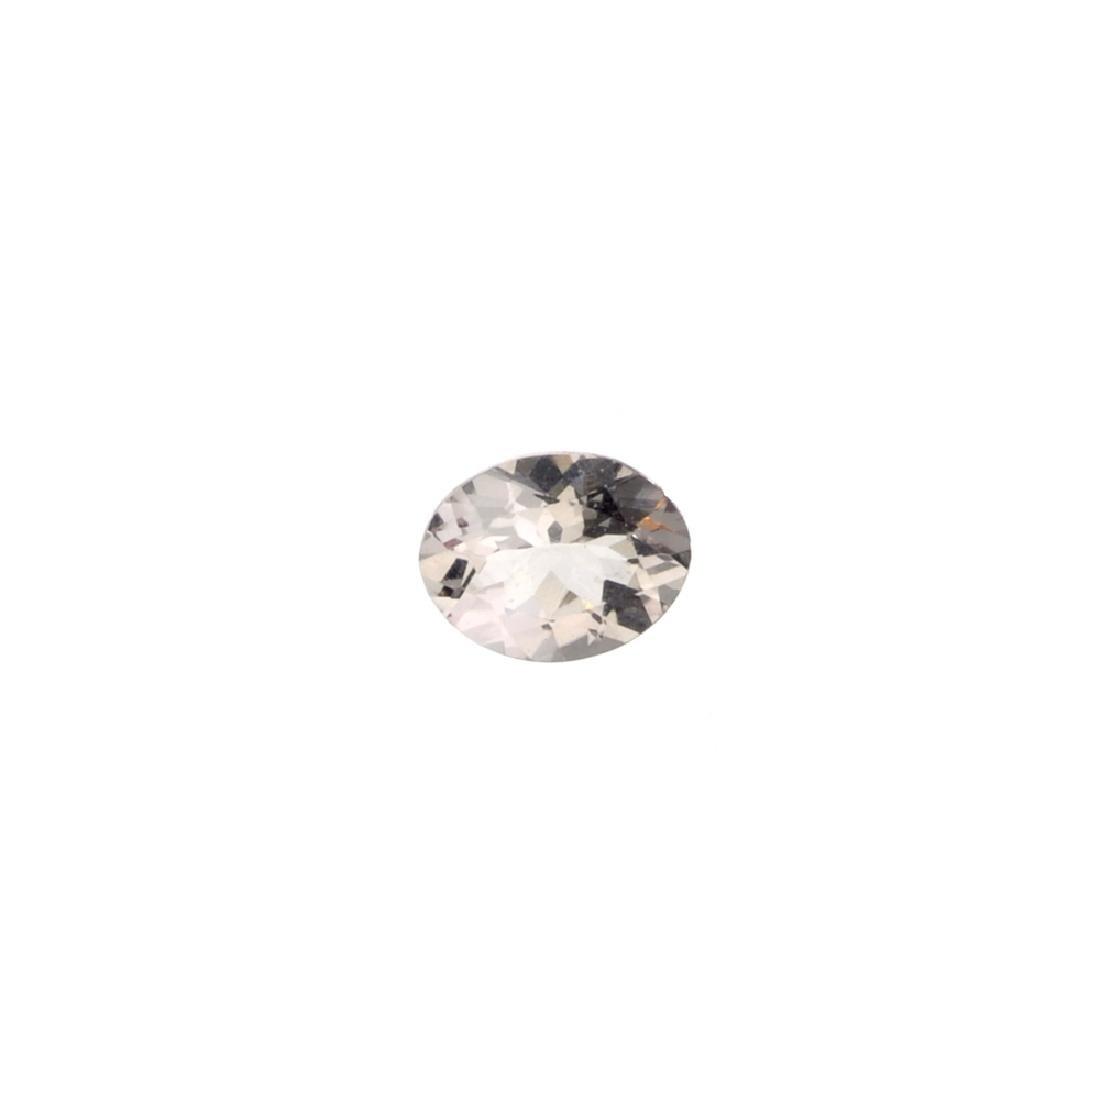 APP: 1.2k 1.78CT Oval Cut Morganite Gemstone